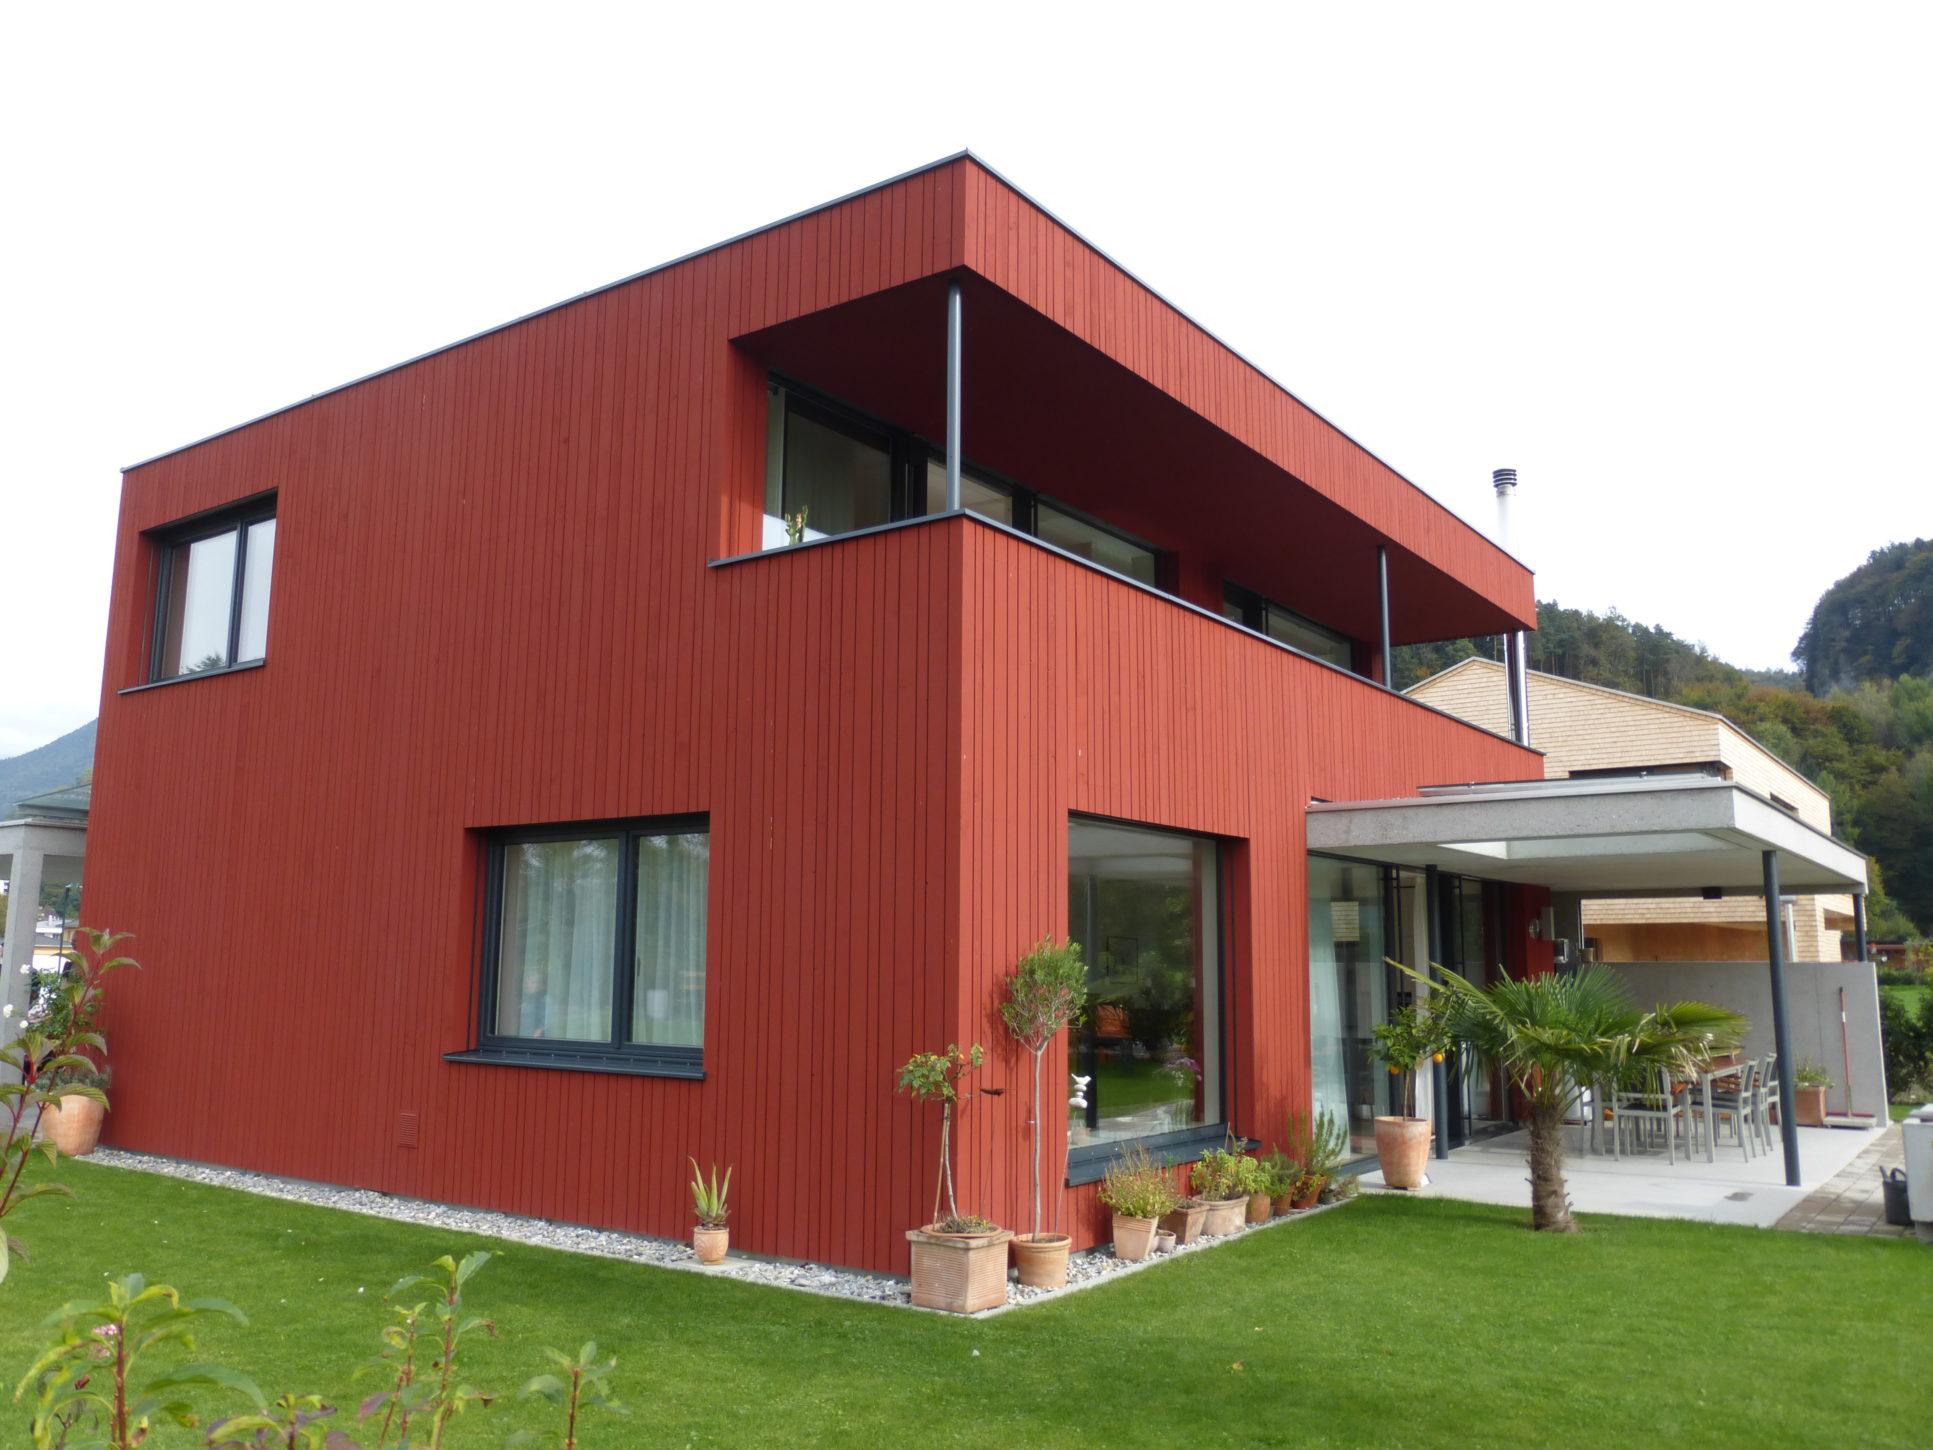 Plus-energie-haus.de - Blogarchiv / Plusenergiehaus & KfW-Förderung